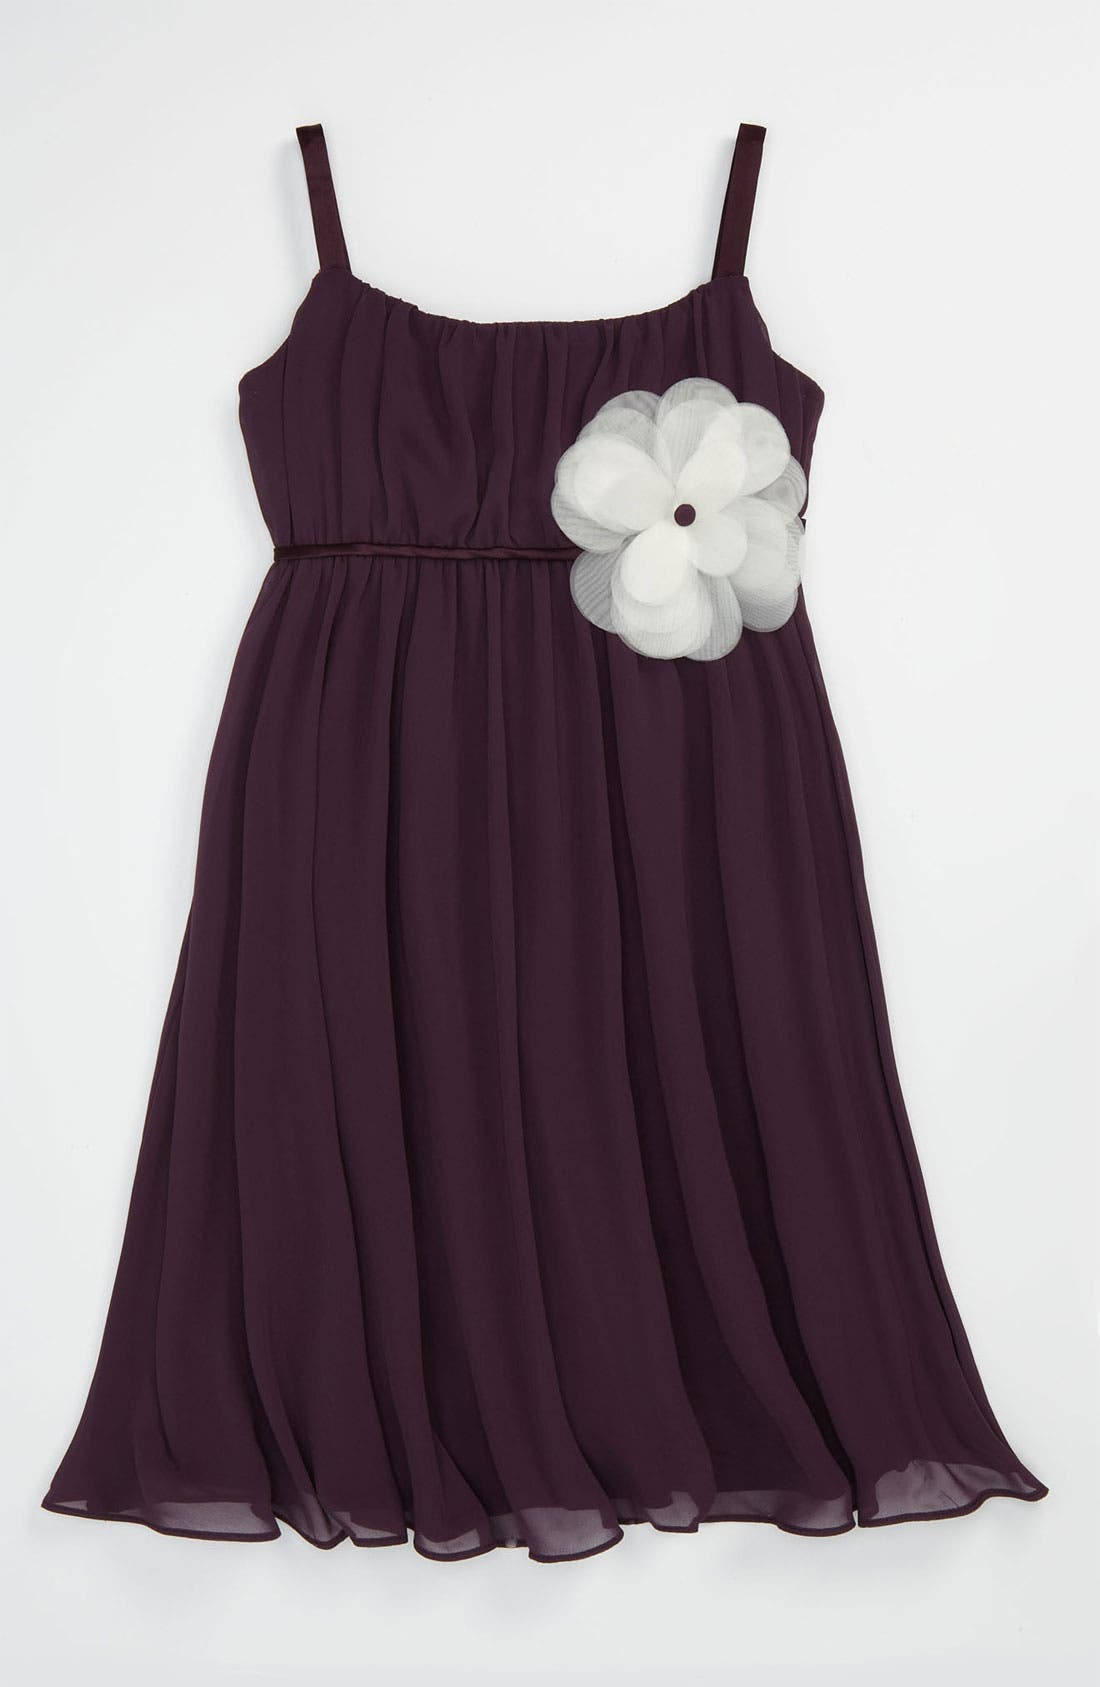 Alternate Image 1 Selected - Us Angels Empire Waist Dress (Little Girls & Big Girls)